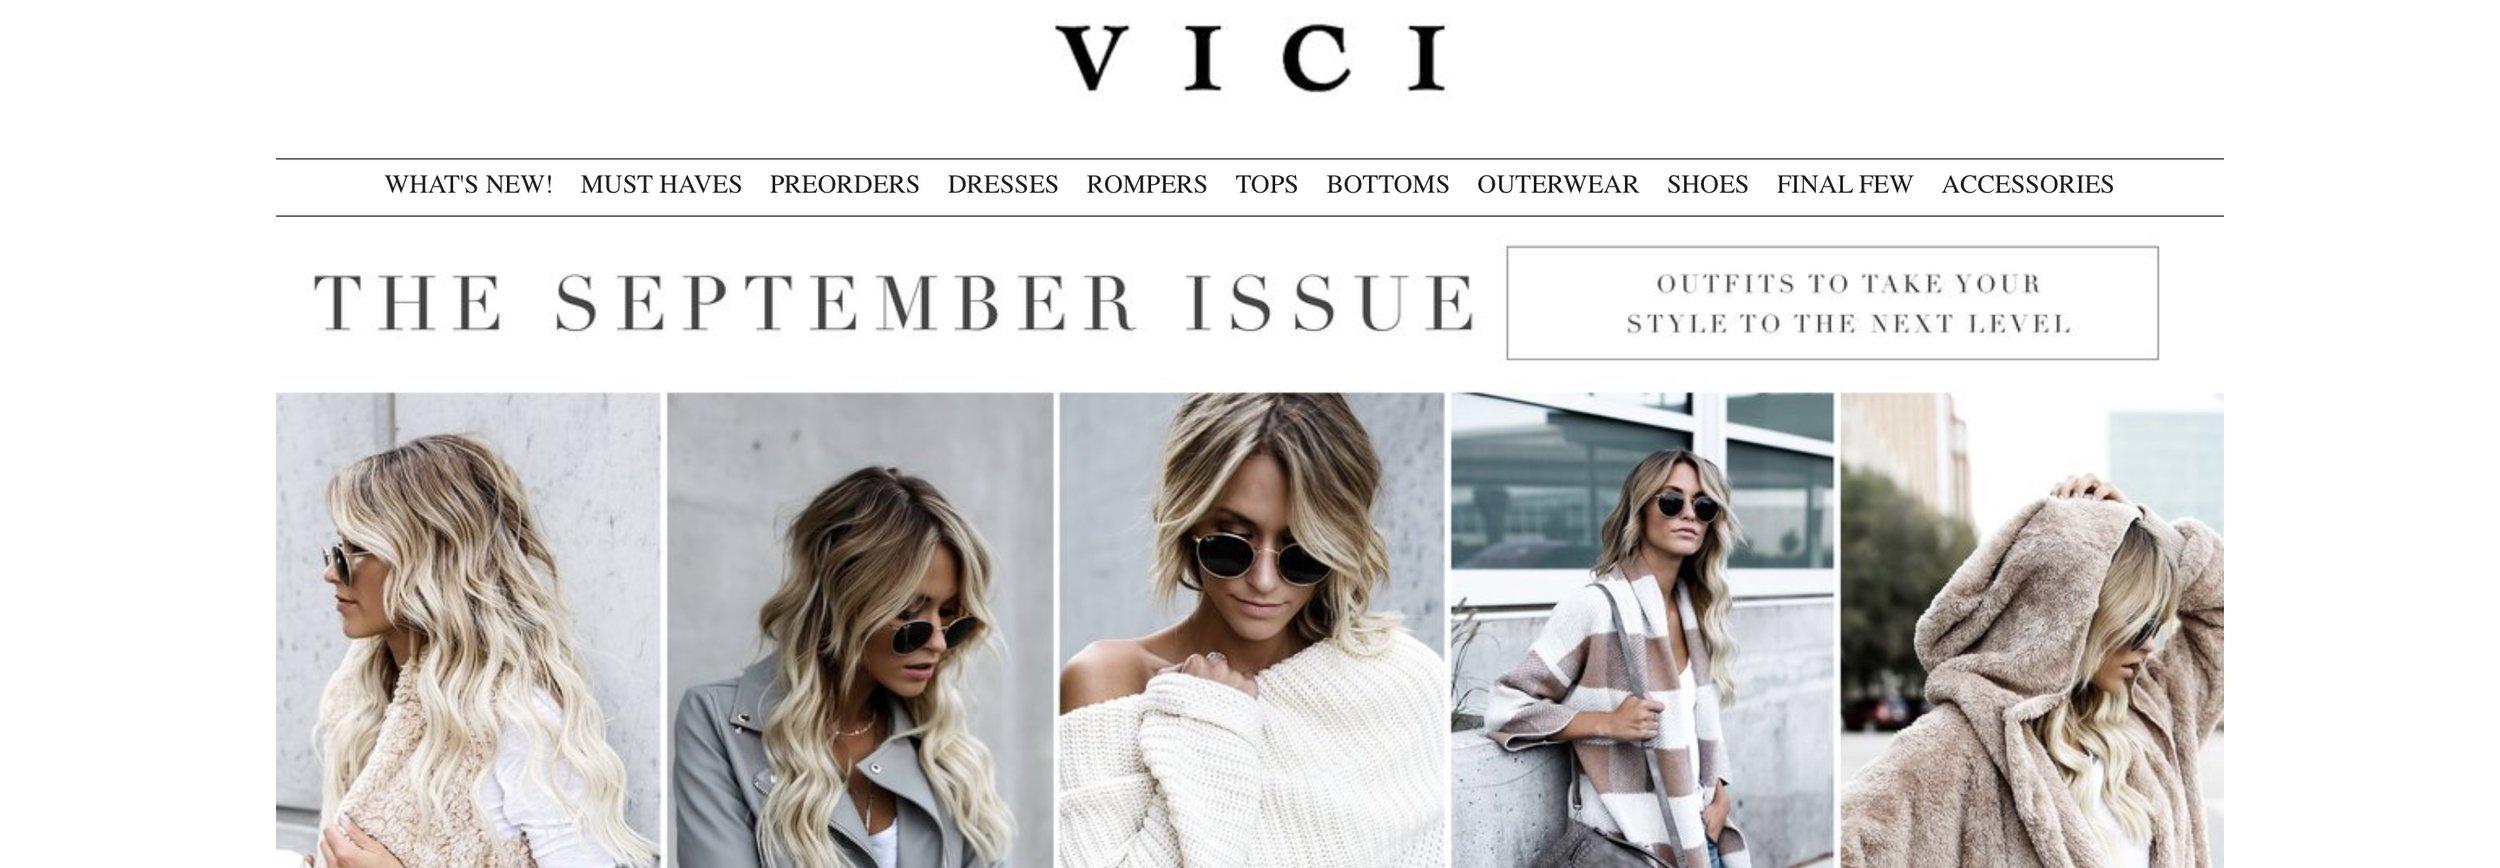 No. 3 - Vici Collection